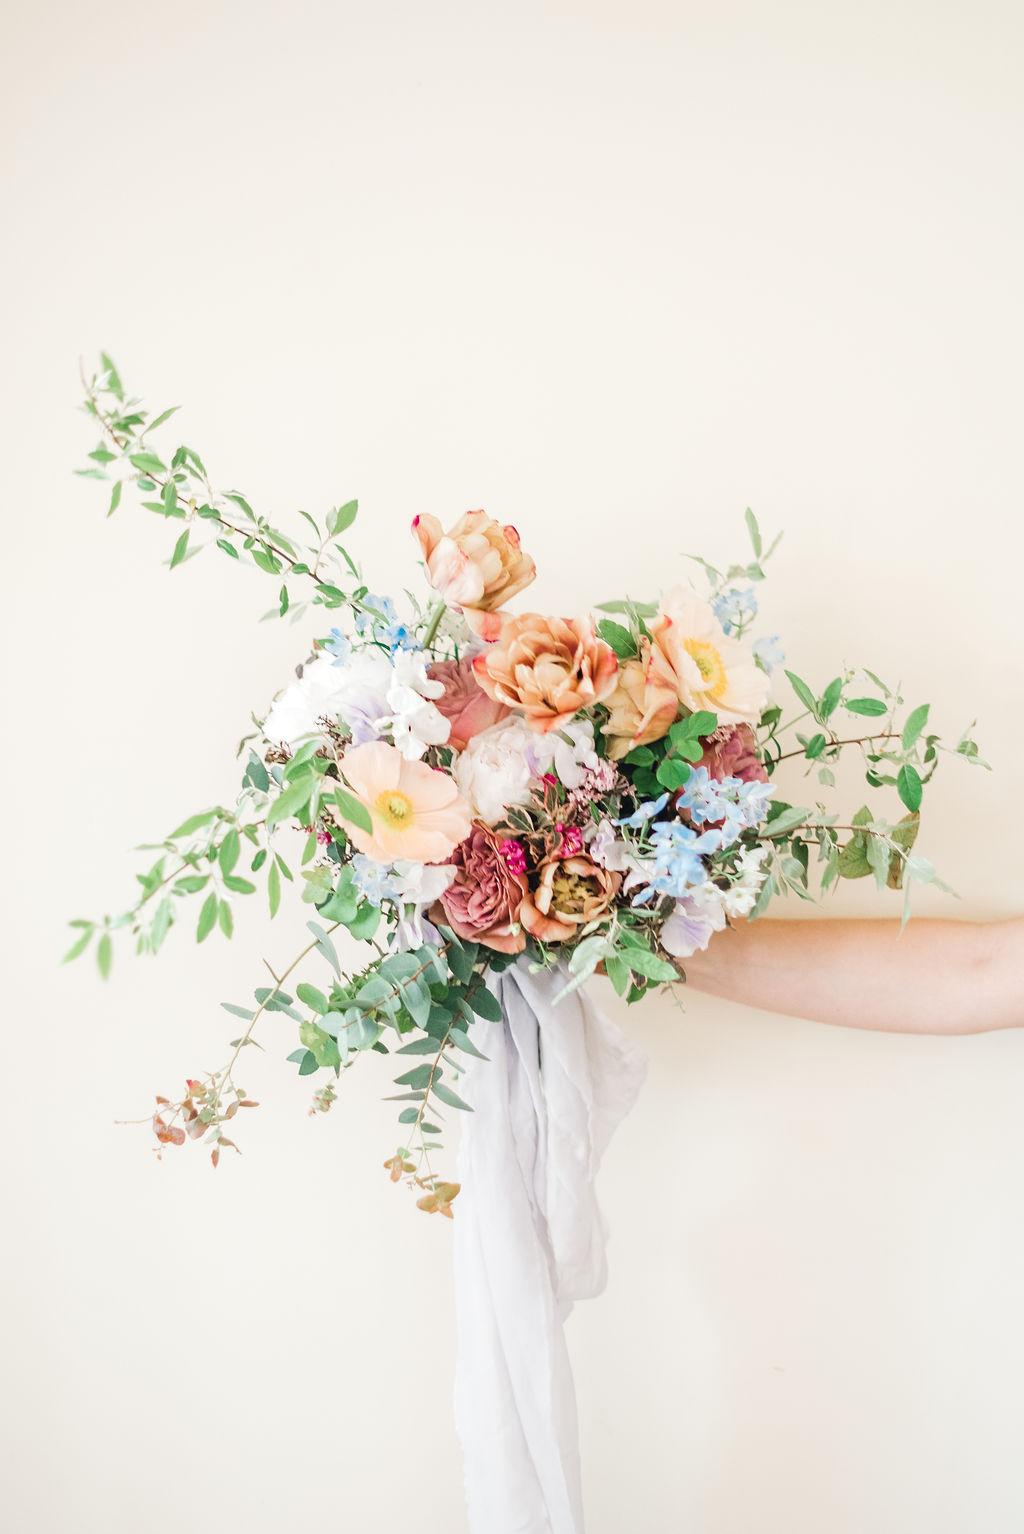 Dayton-event-planner-styling-wedding-floral-bouquet